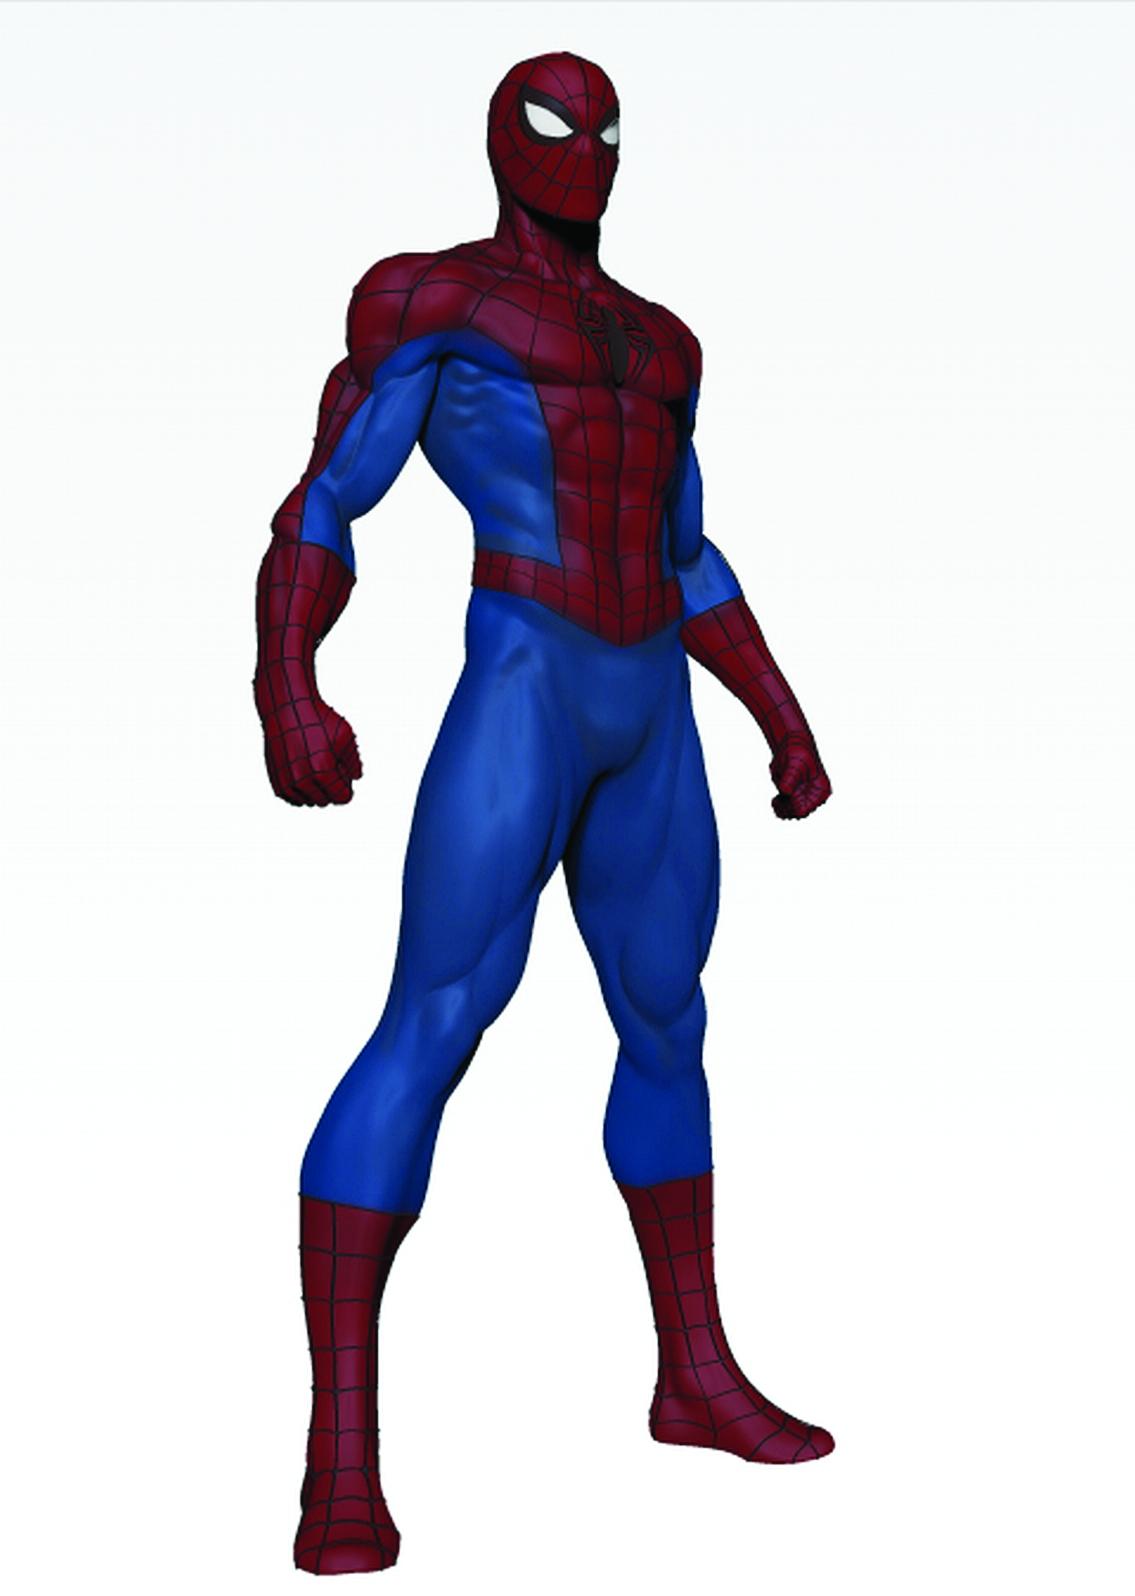 Spiderman cartoon standing - photo#3